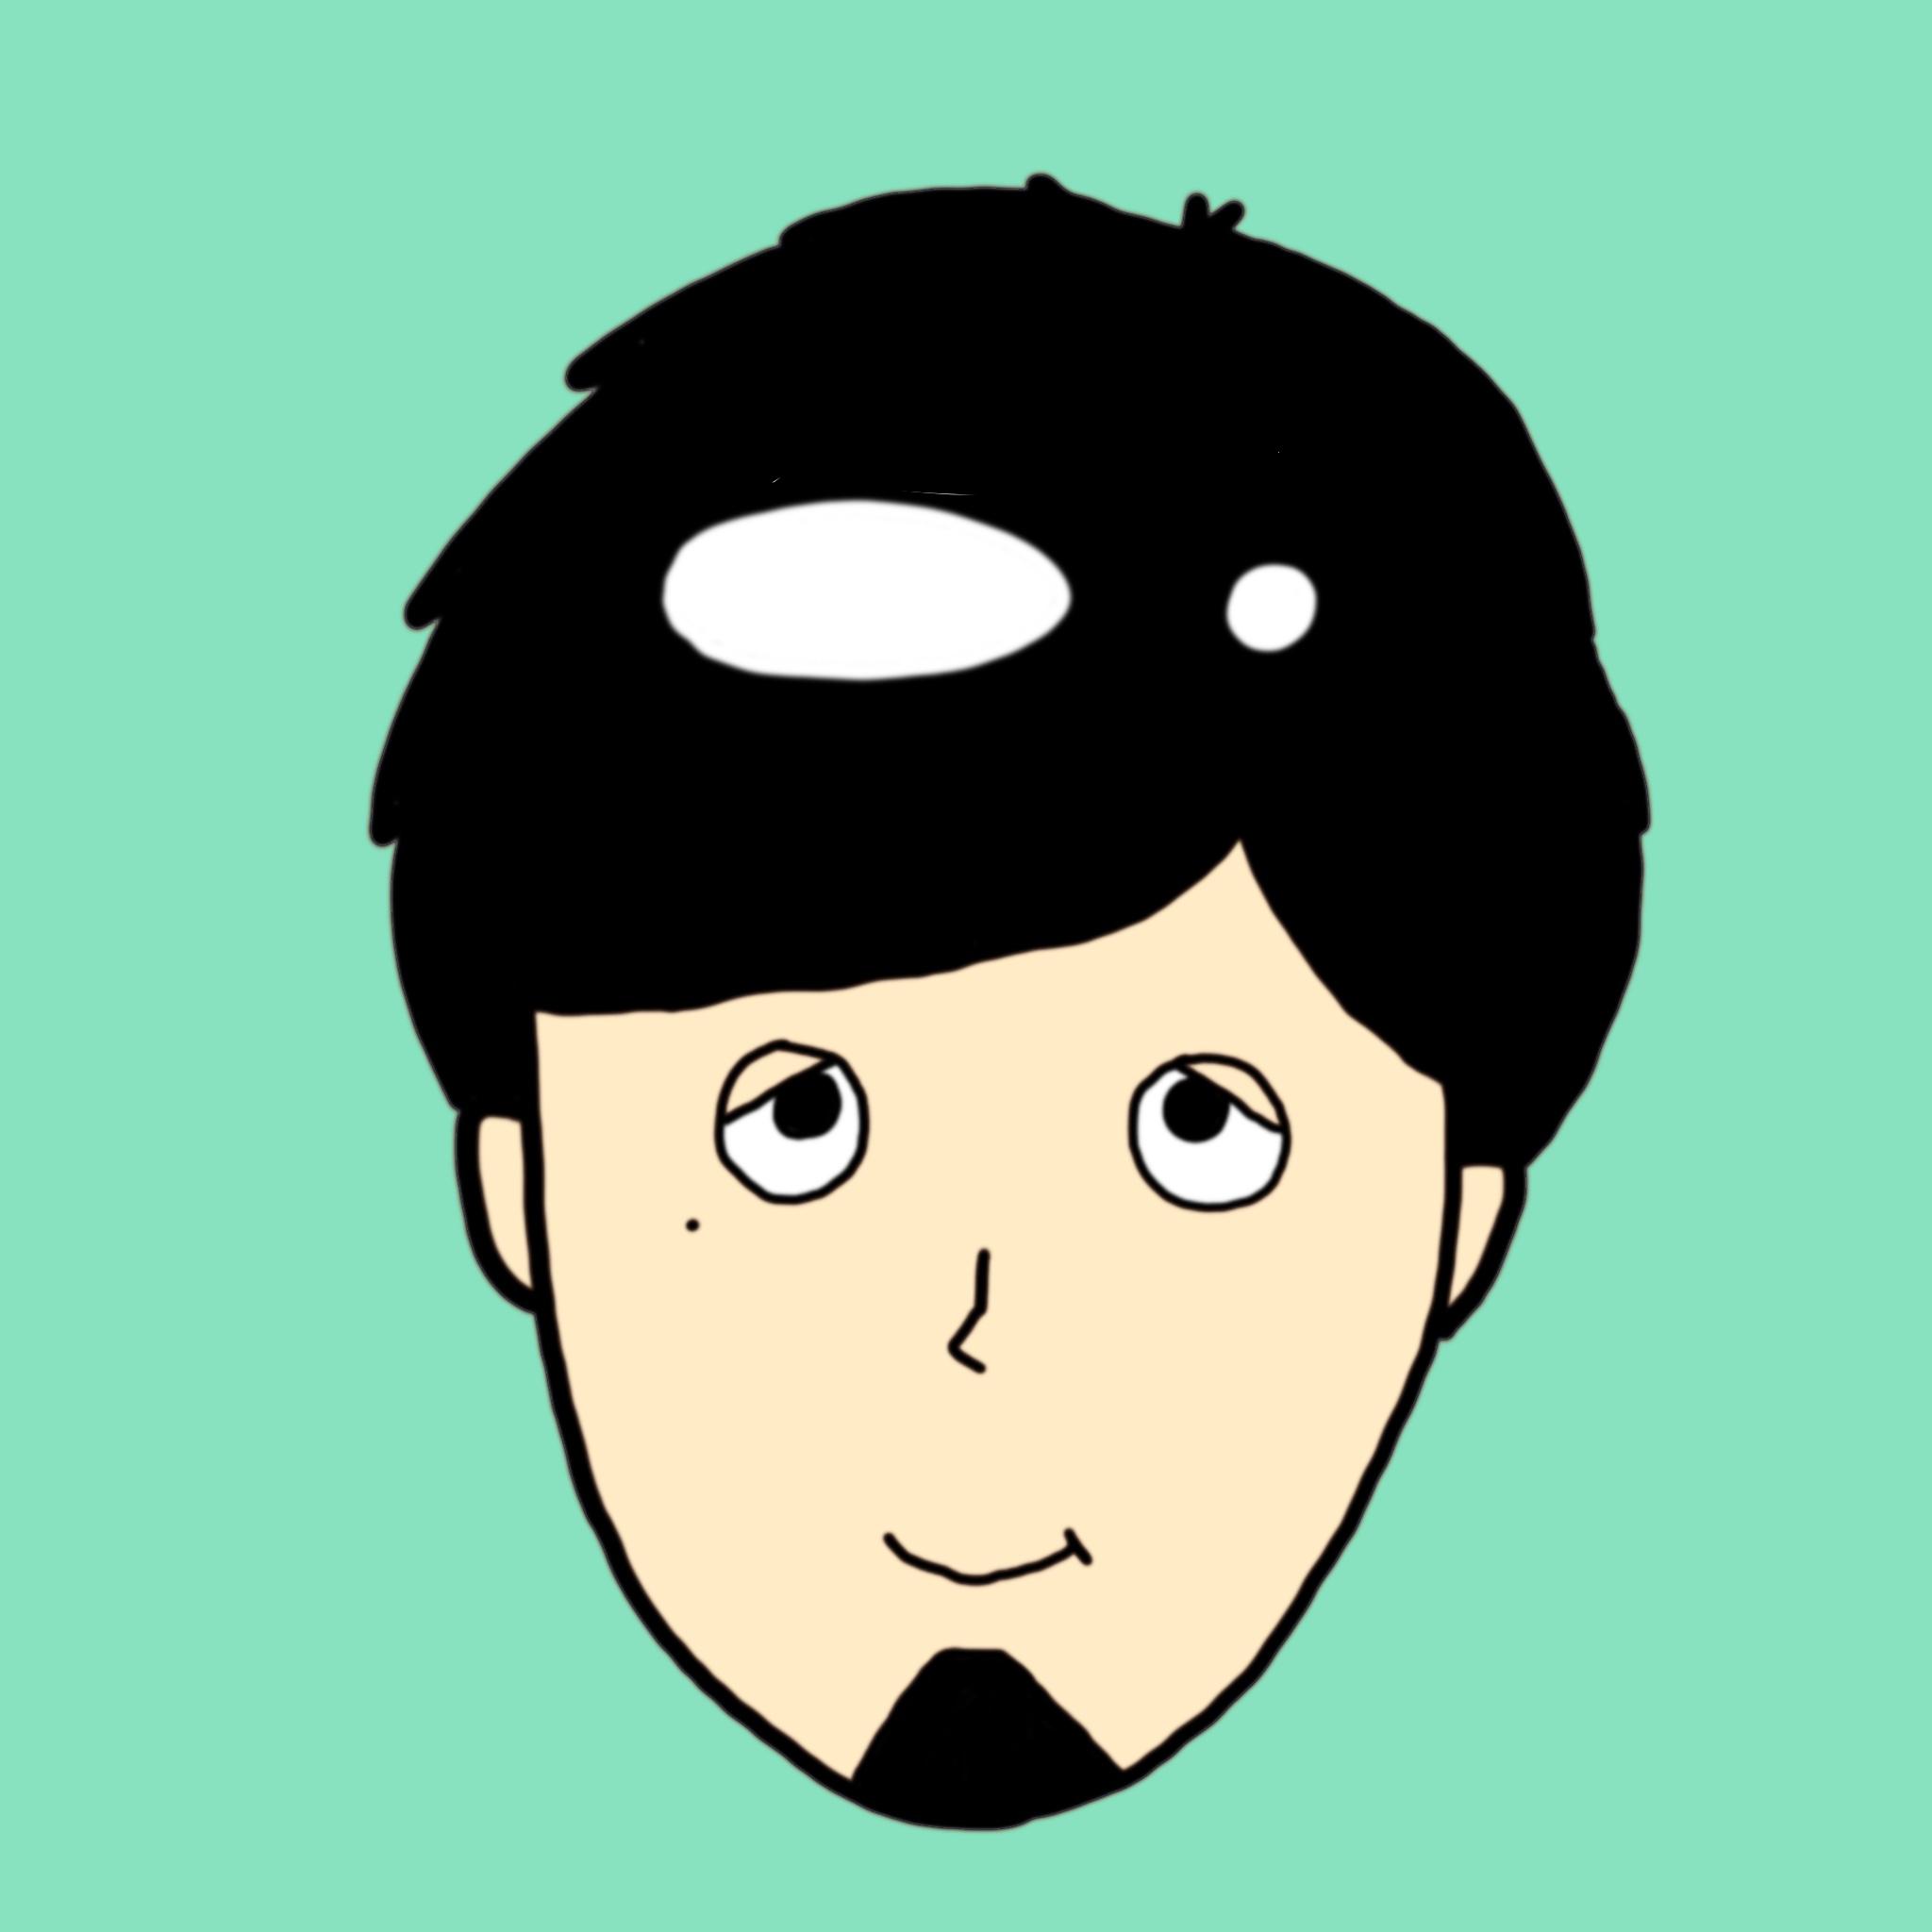 https://www.tsuzukiblog.org/wp-content/uploads/2018/10/43ca64de9520f178ab62afe94fdec80d.jpg